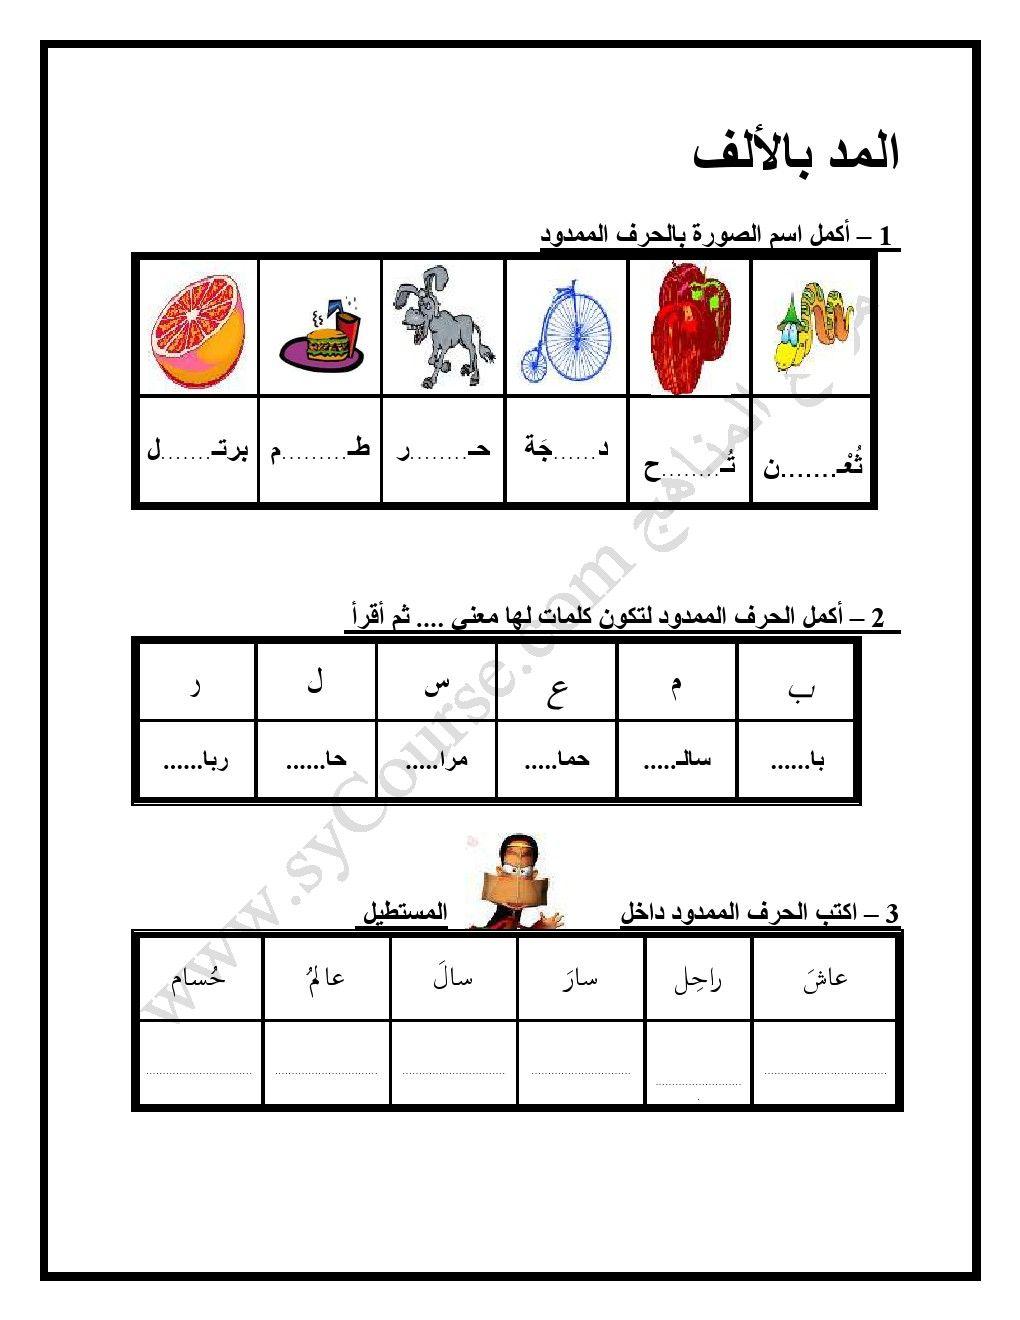 0010 Jpg 1020 1320 Arabic Alphabet Arabic Kids Learning Arabic